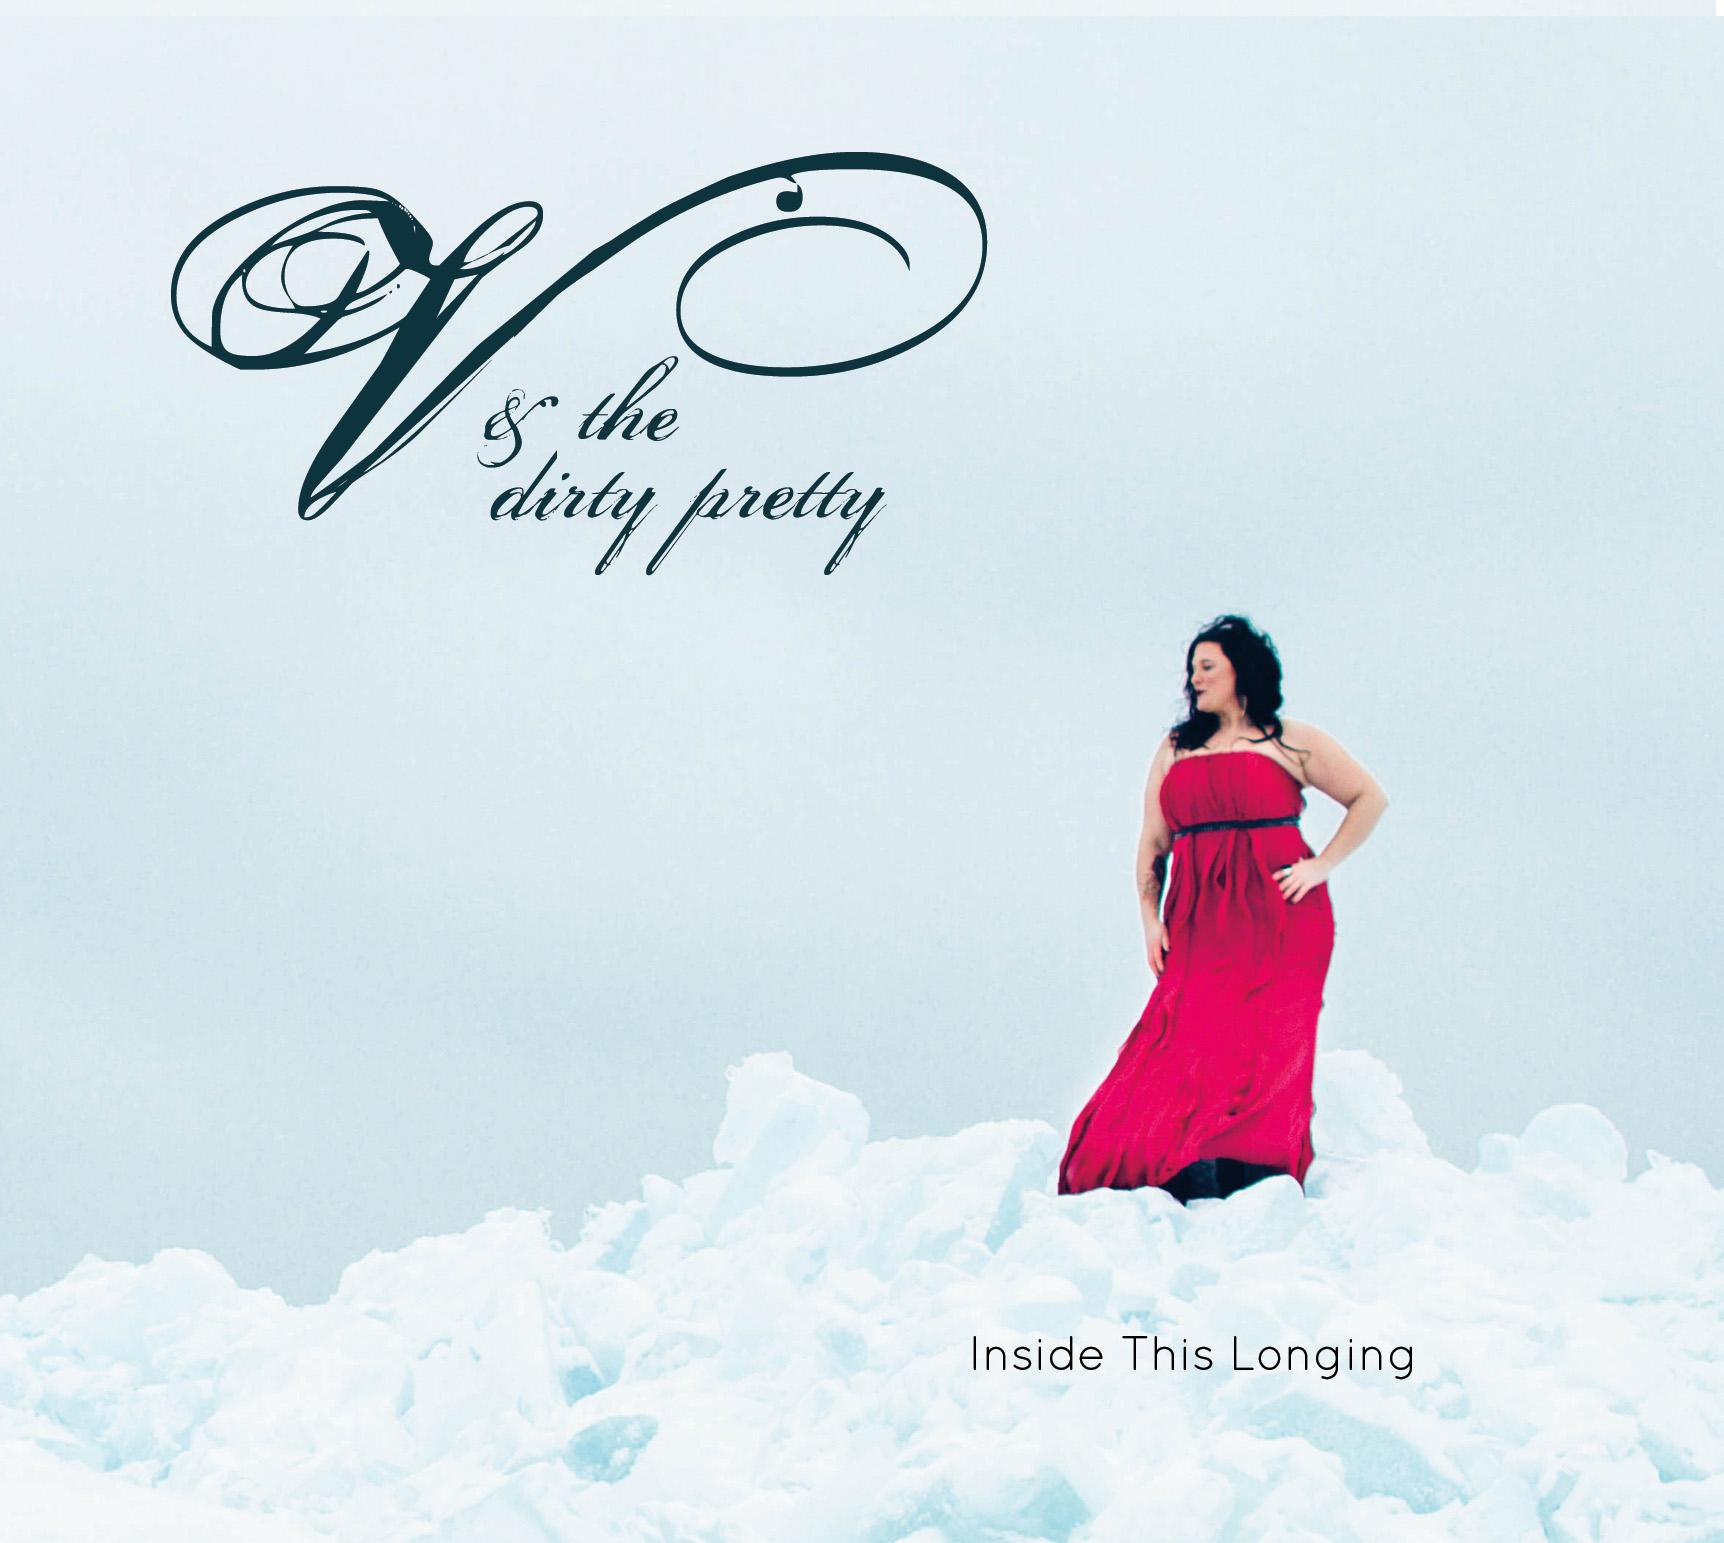 V & the Dirty Pretty - Album Cover